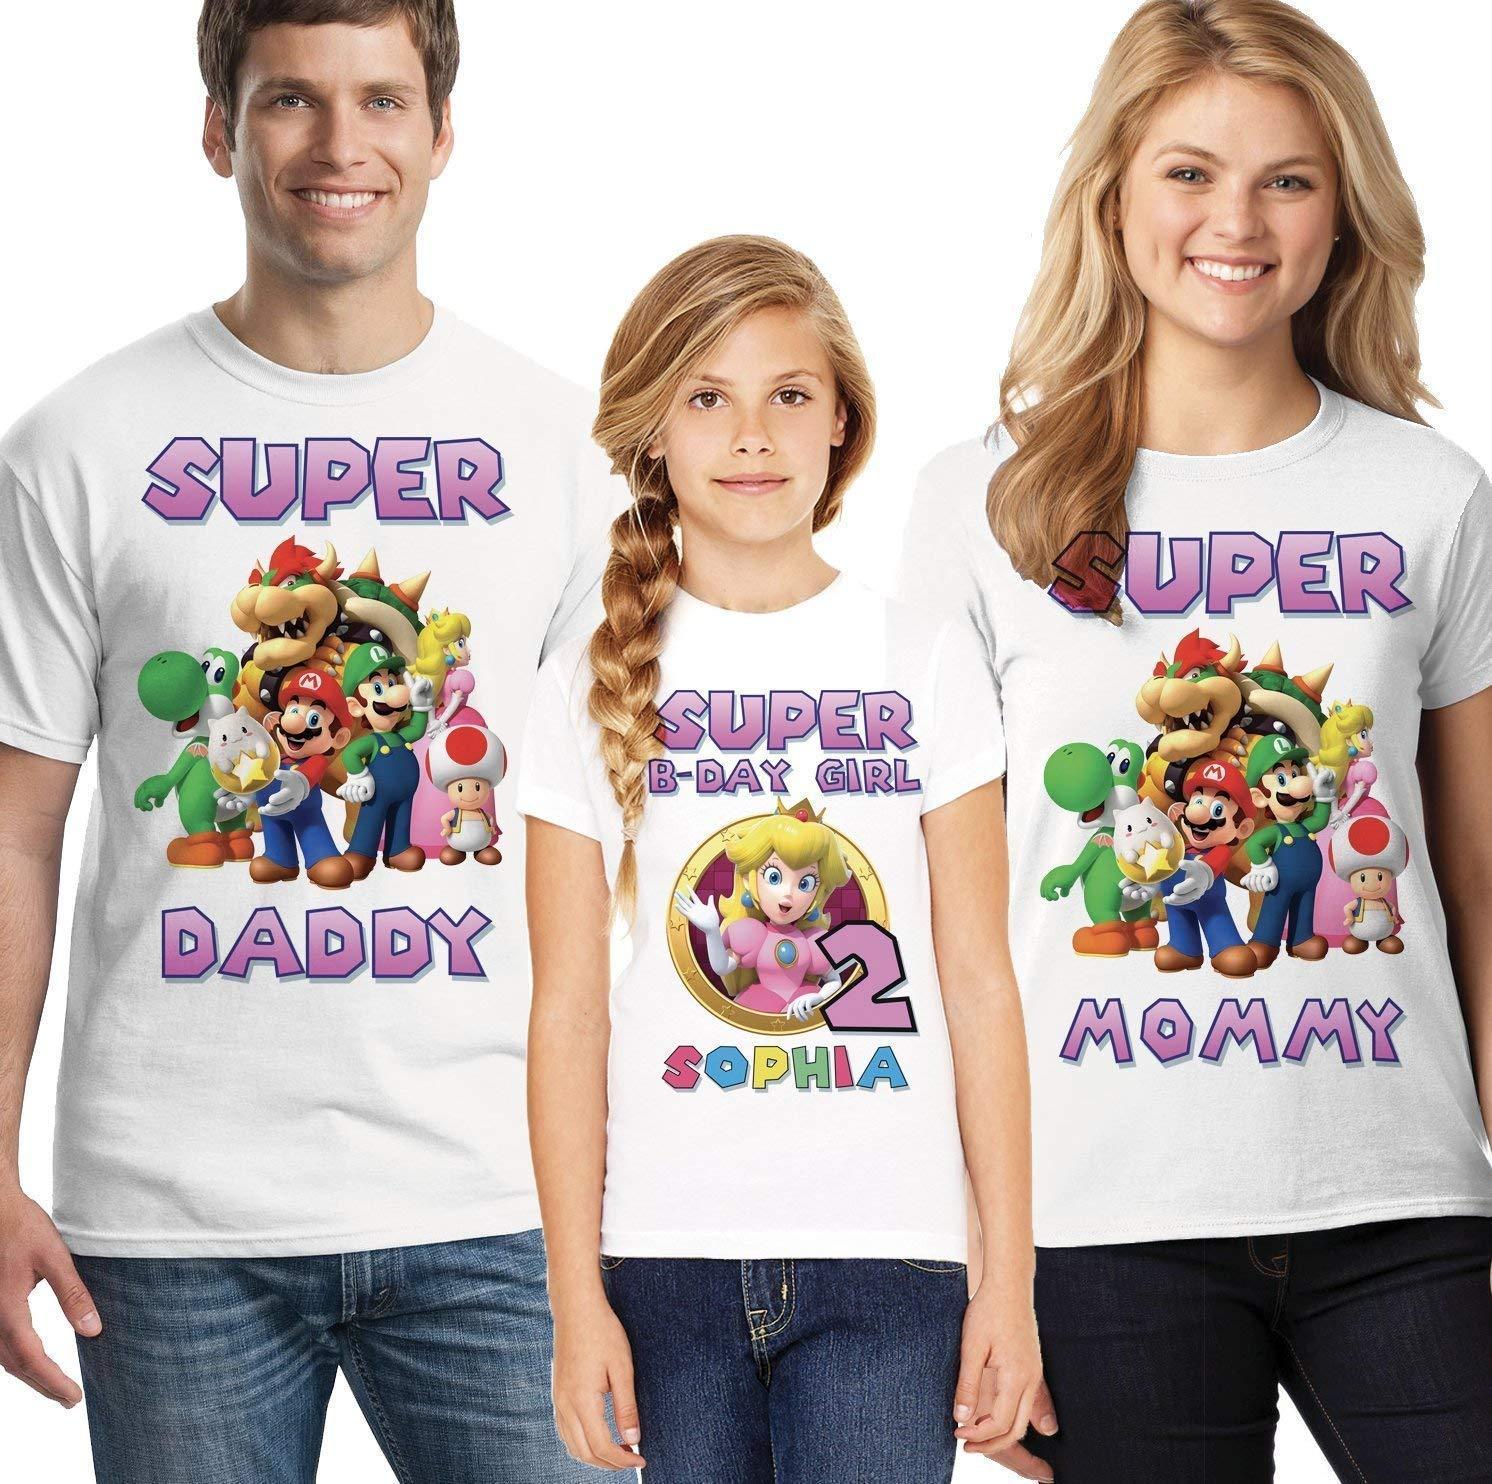 Personalized Princess Peach Birthday T-Shirt